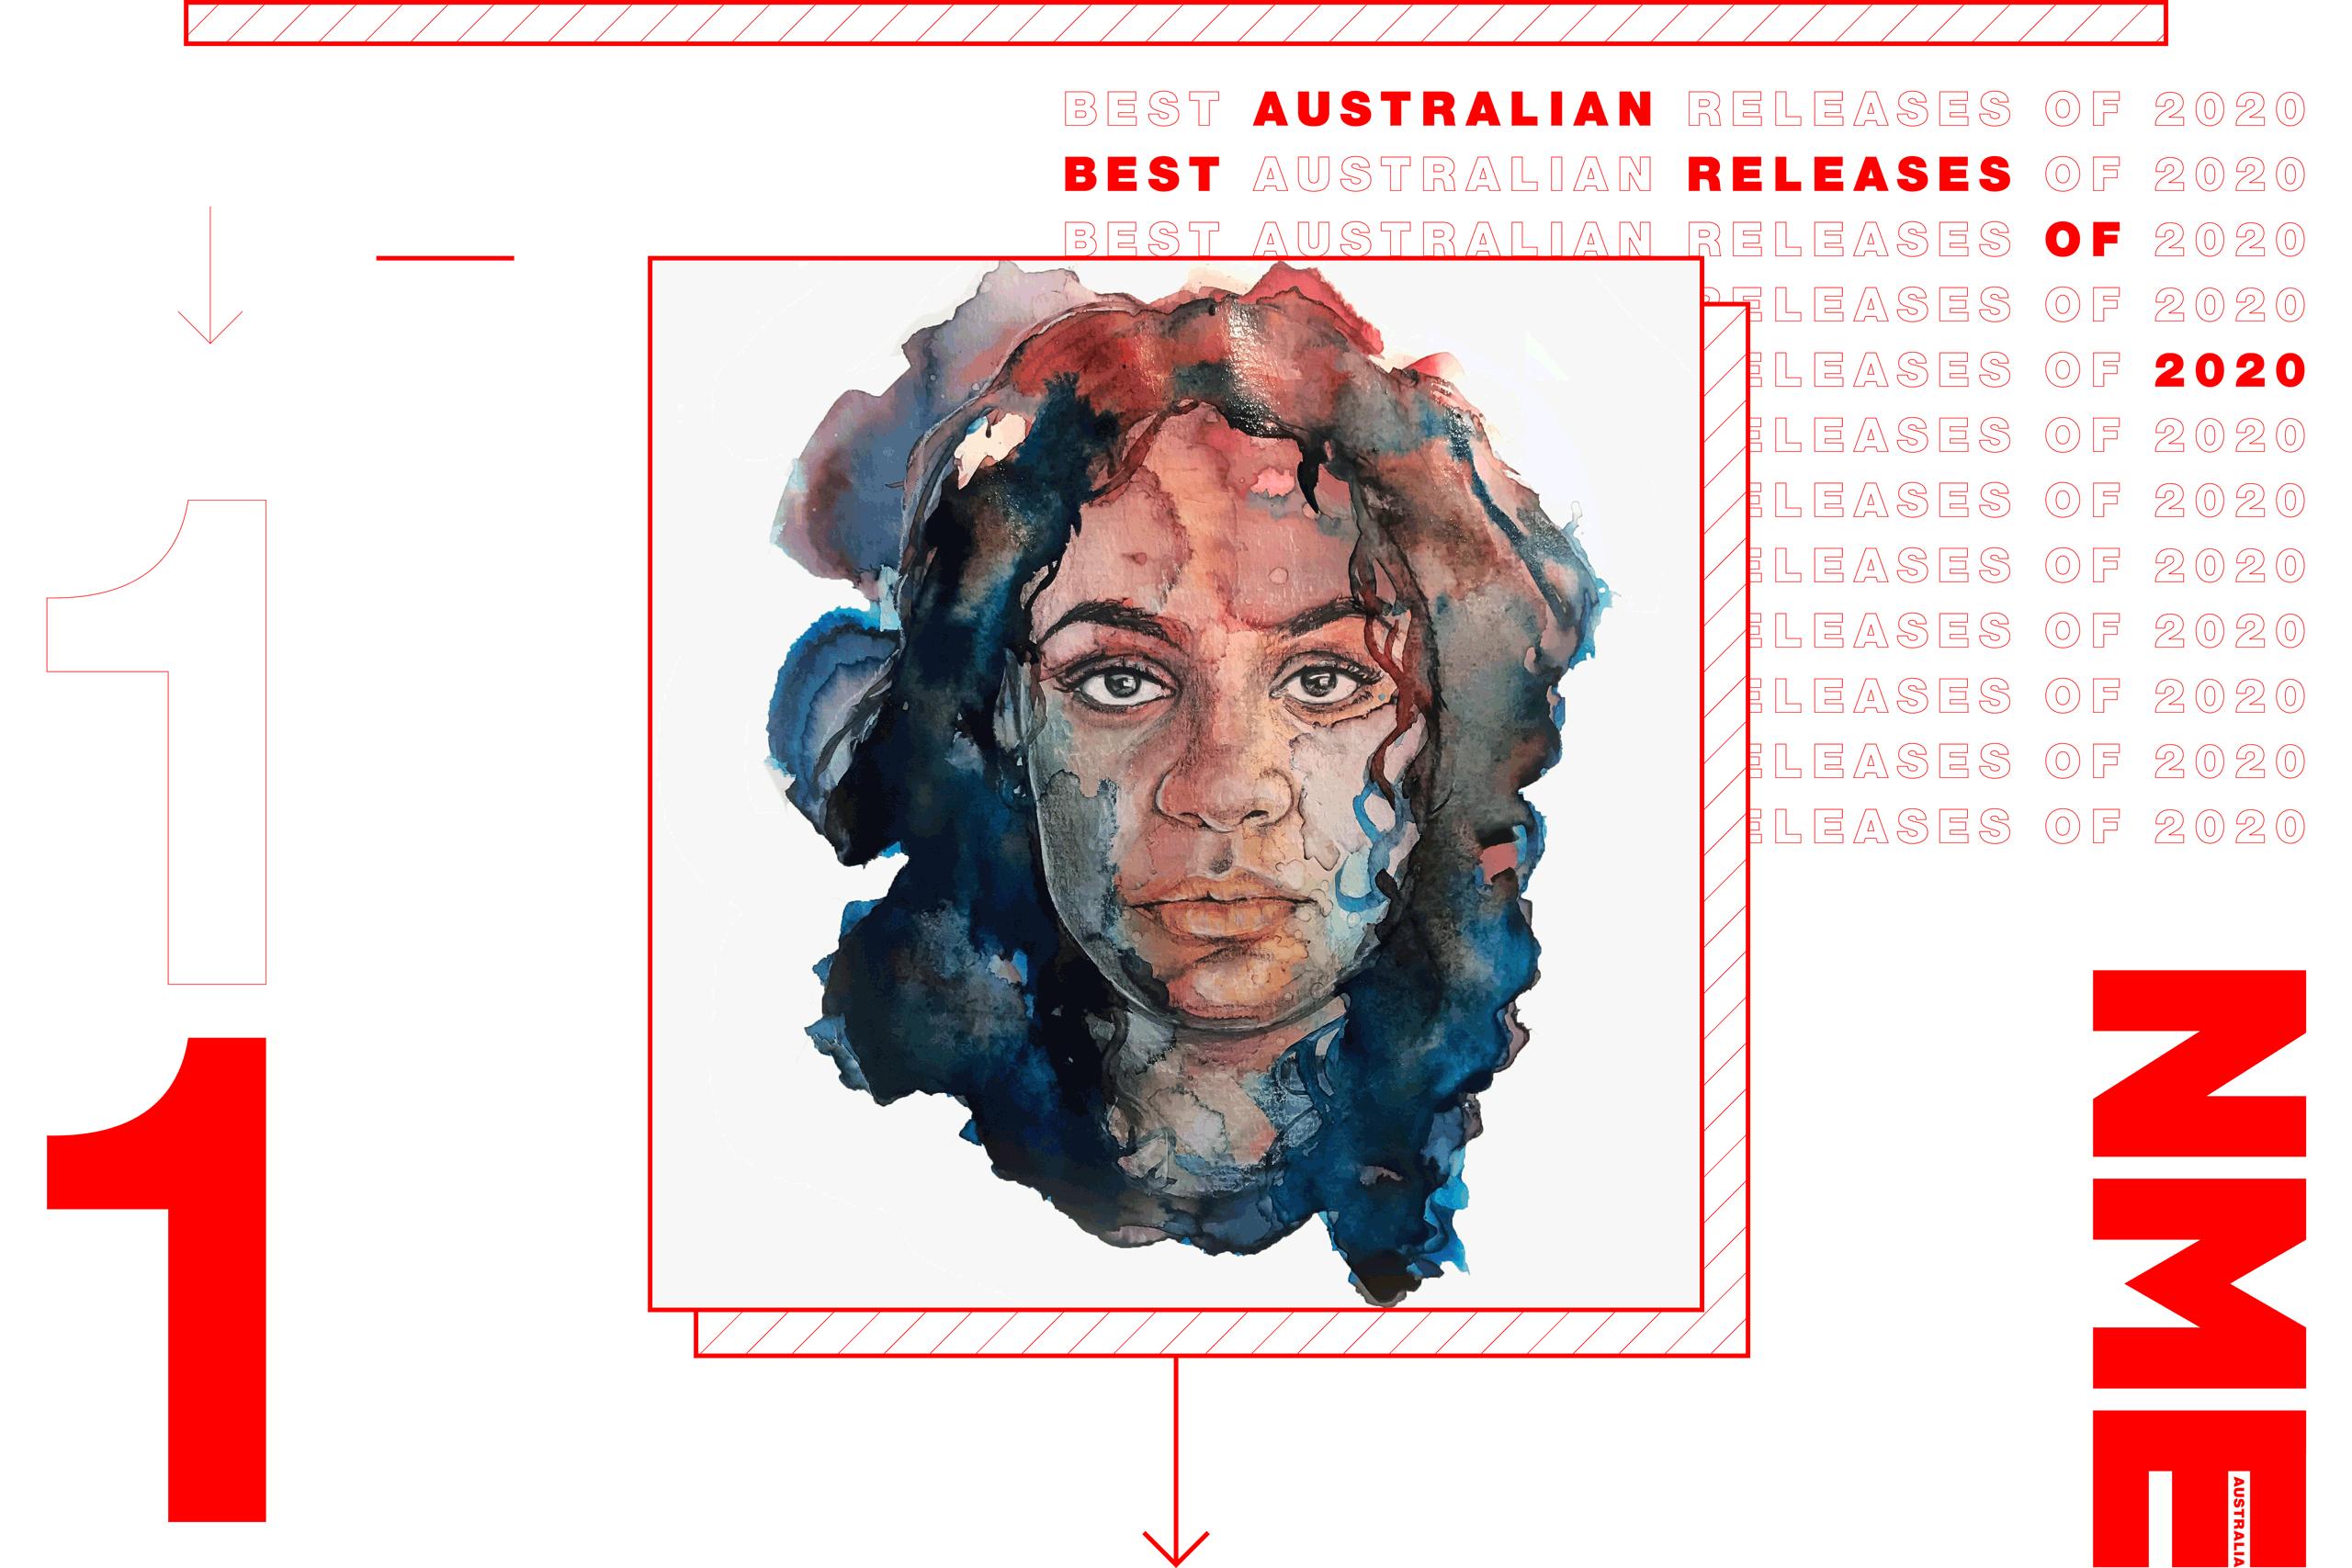 NME Australian Album Release 1